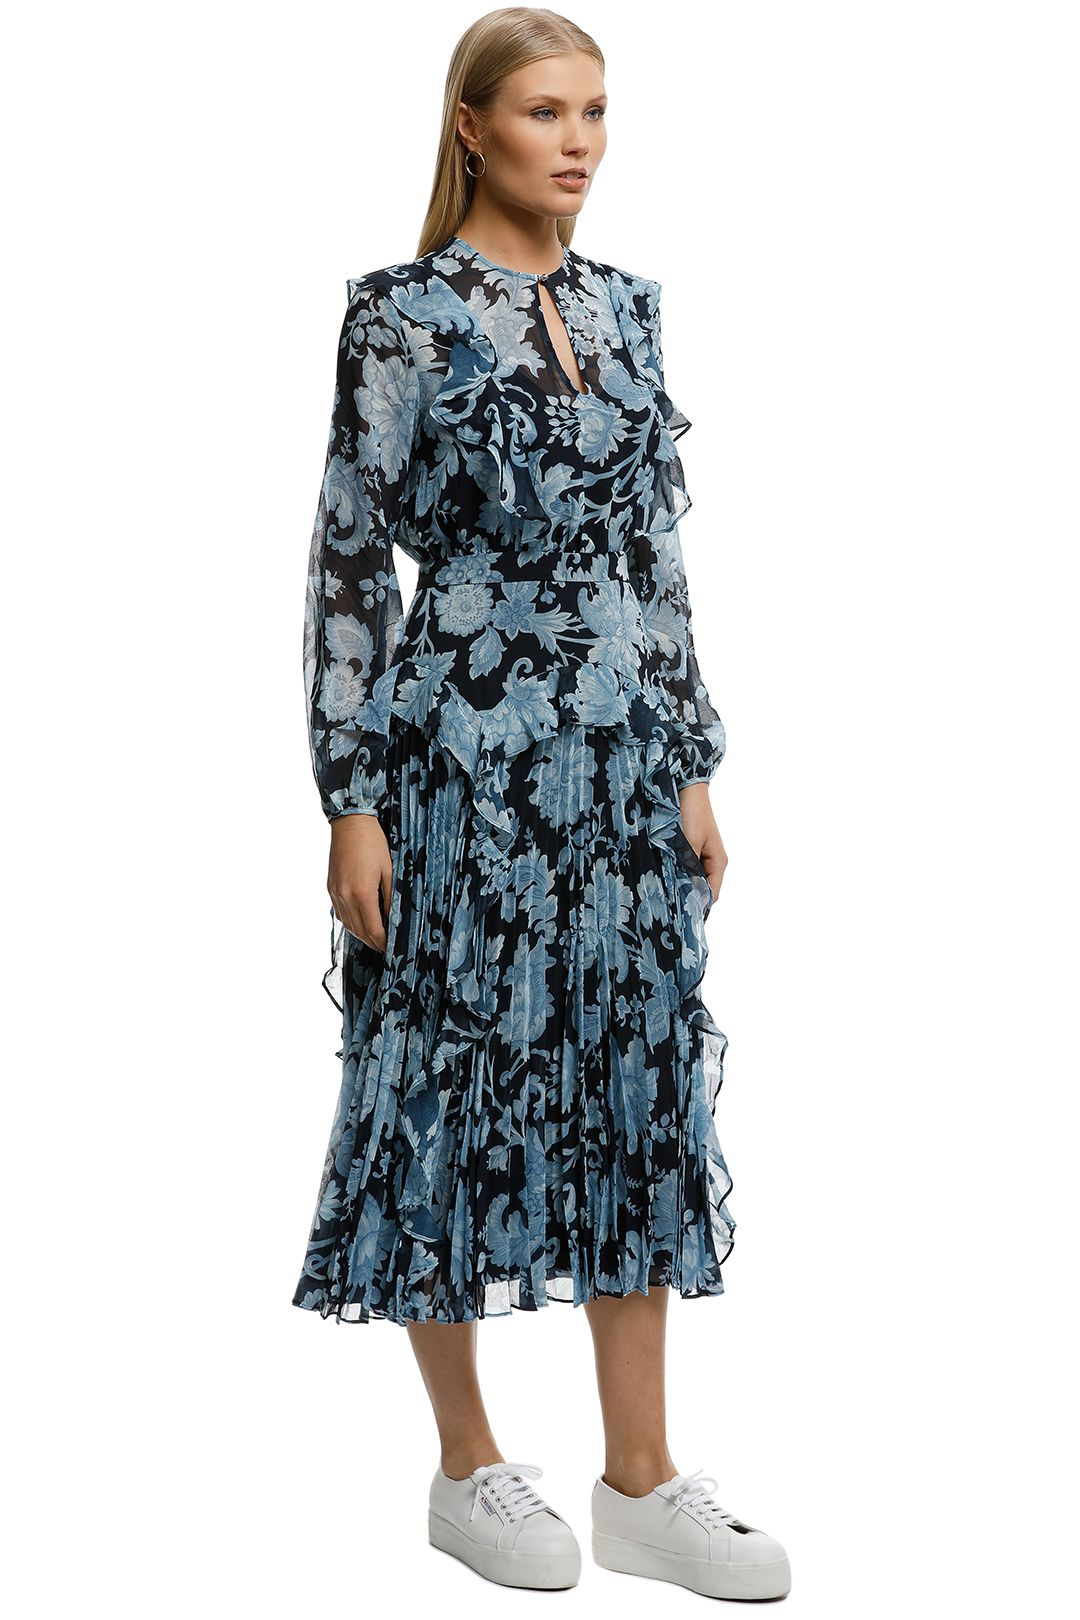 Lover-Florence Pleat Midi Dress-Navy-Side